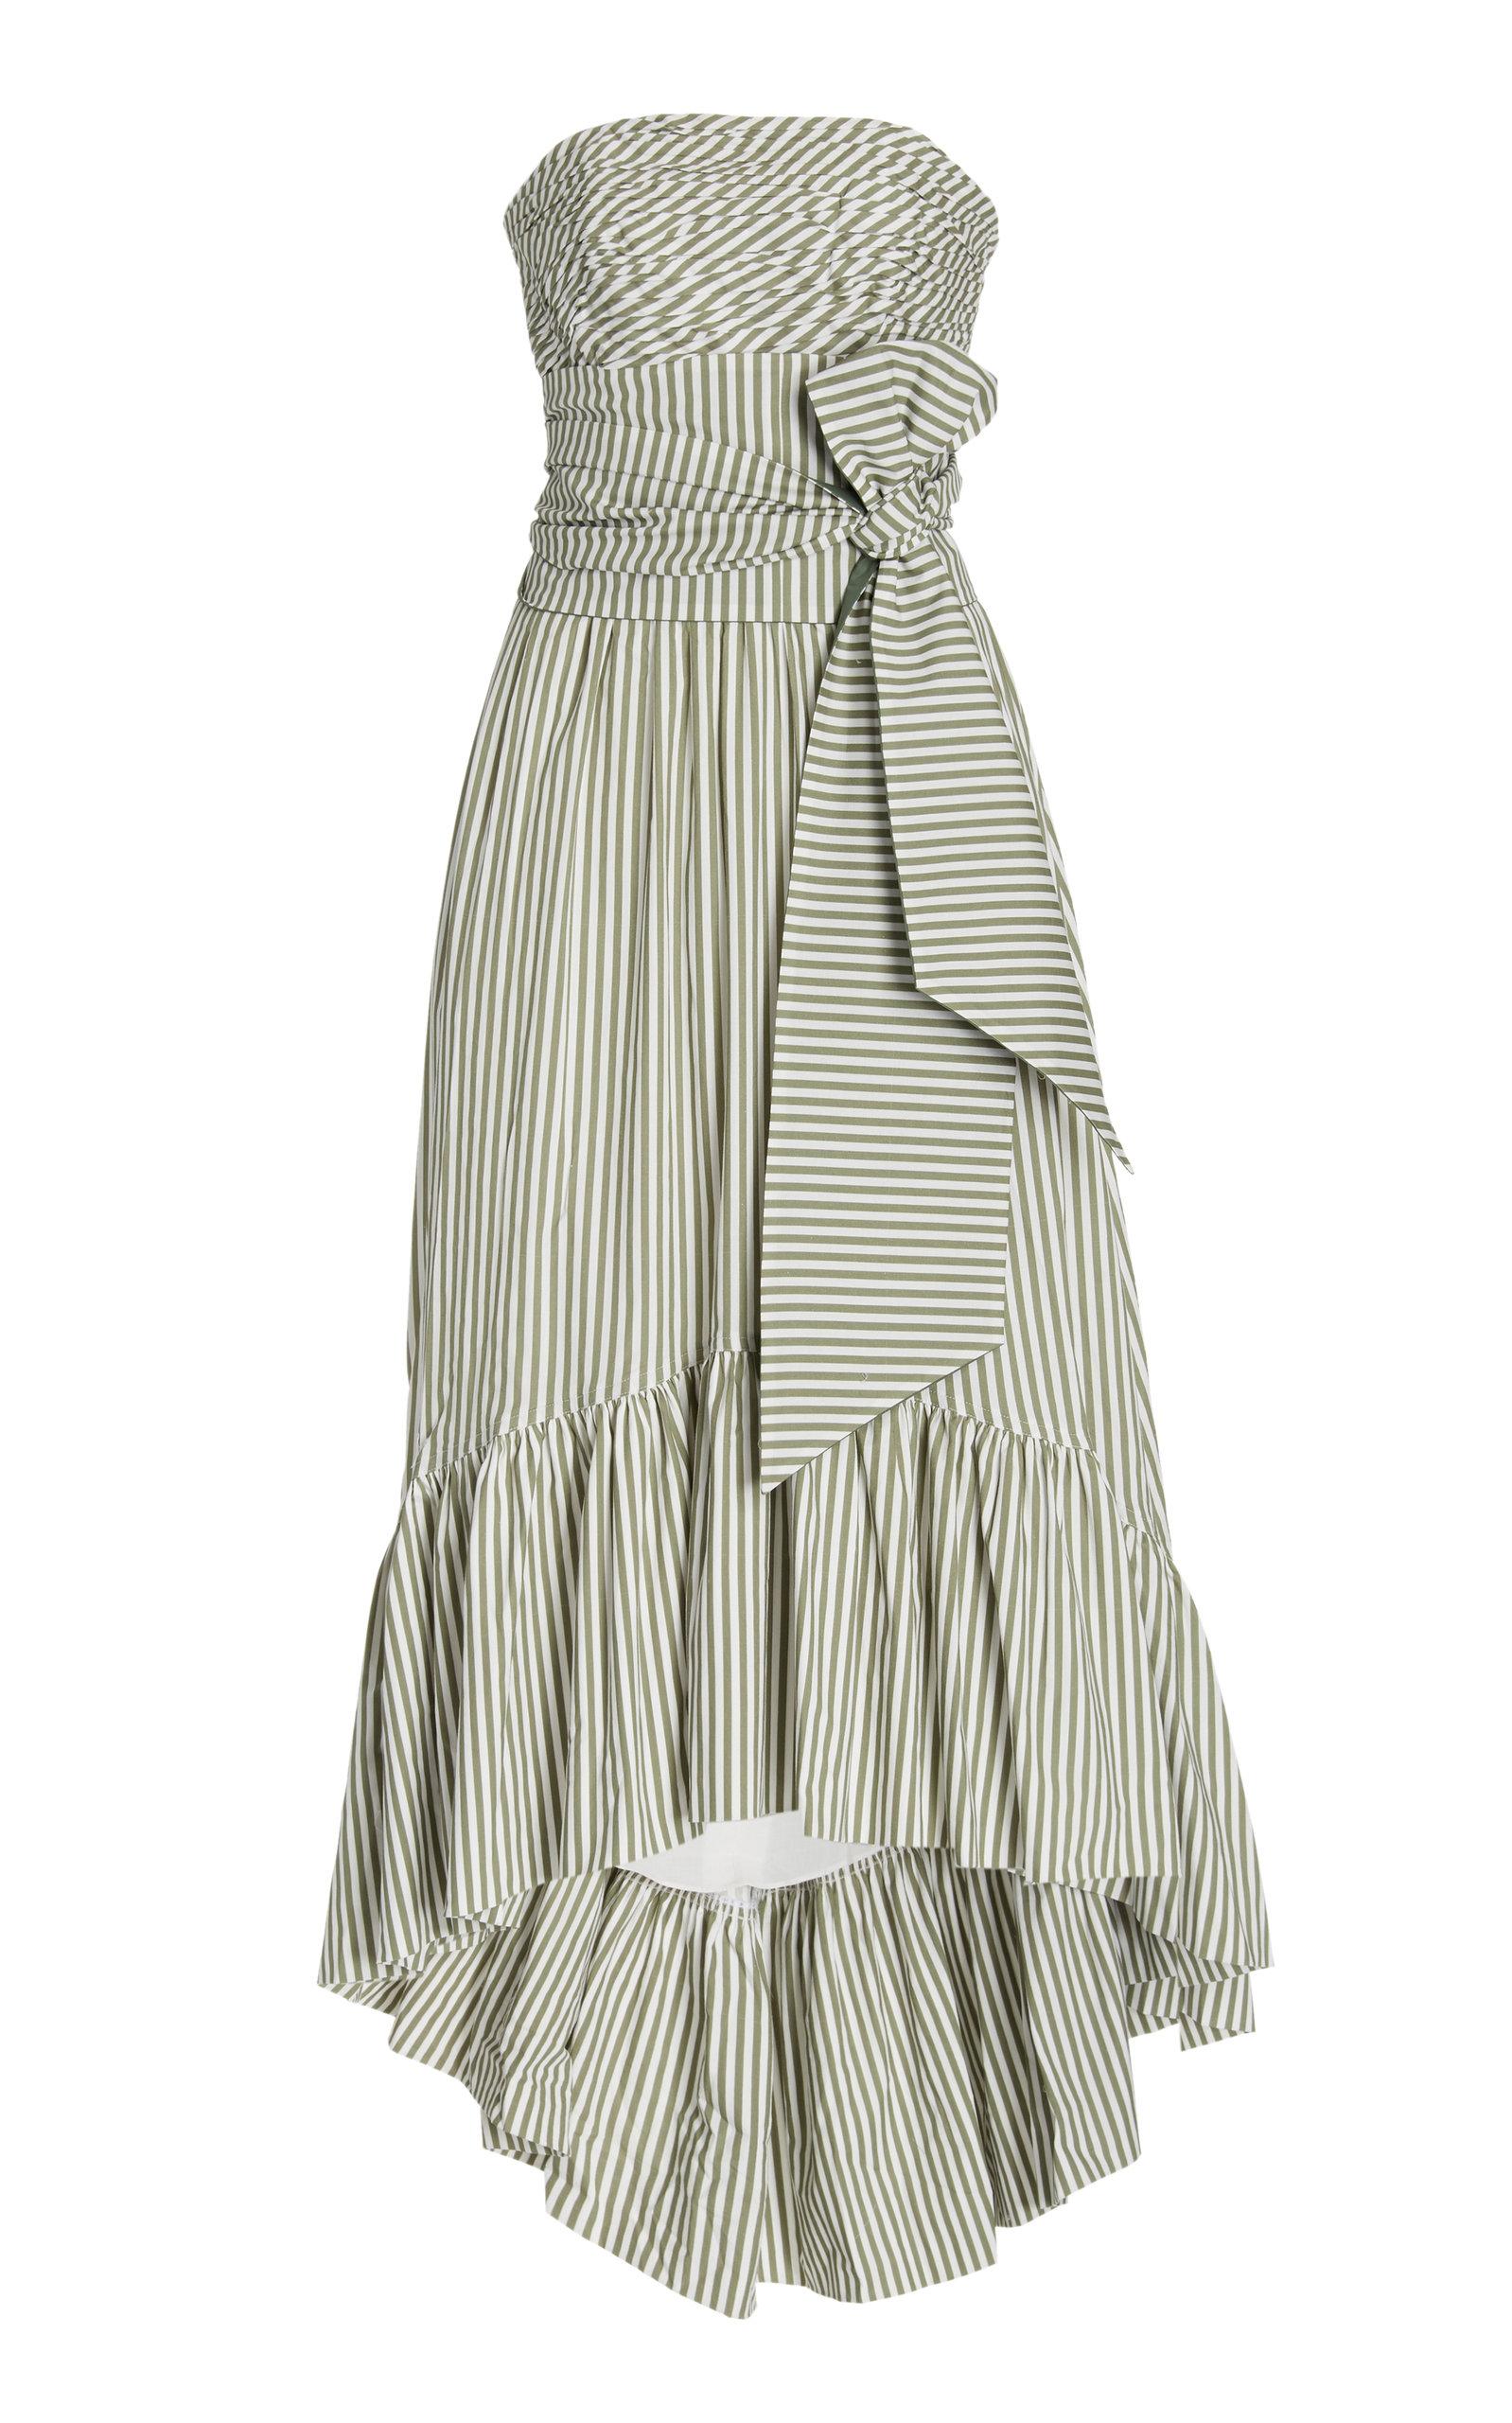 Andres Otalora Caiman Belted Cotton Midi Dress In Stripe